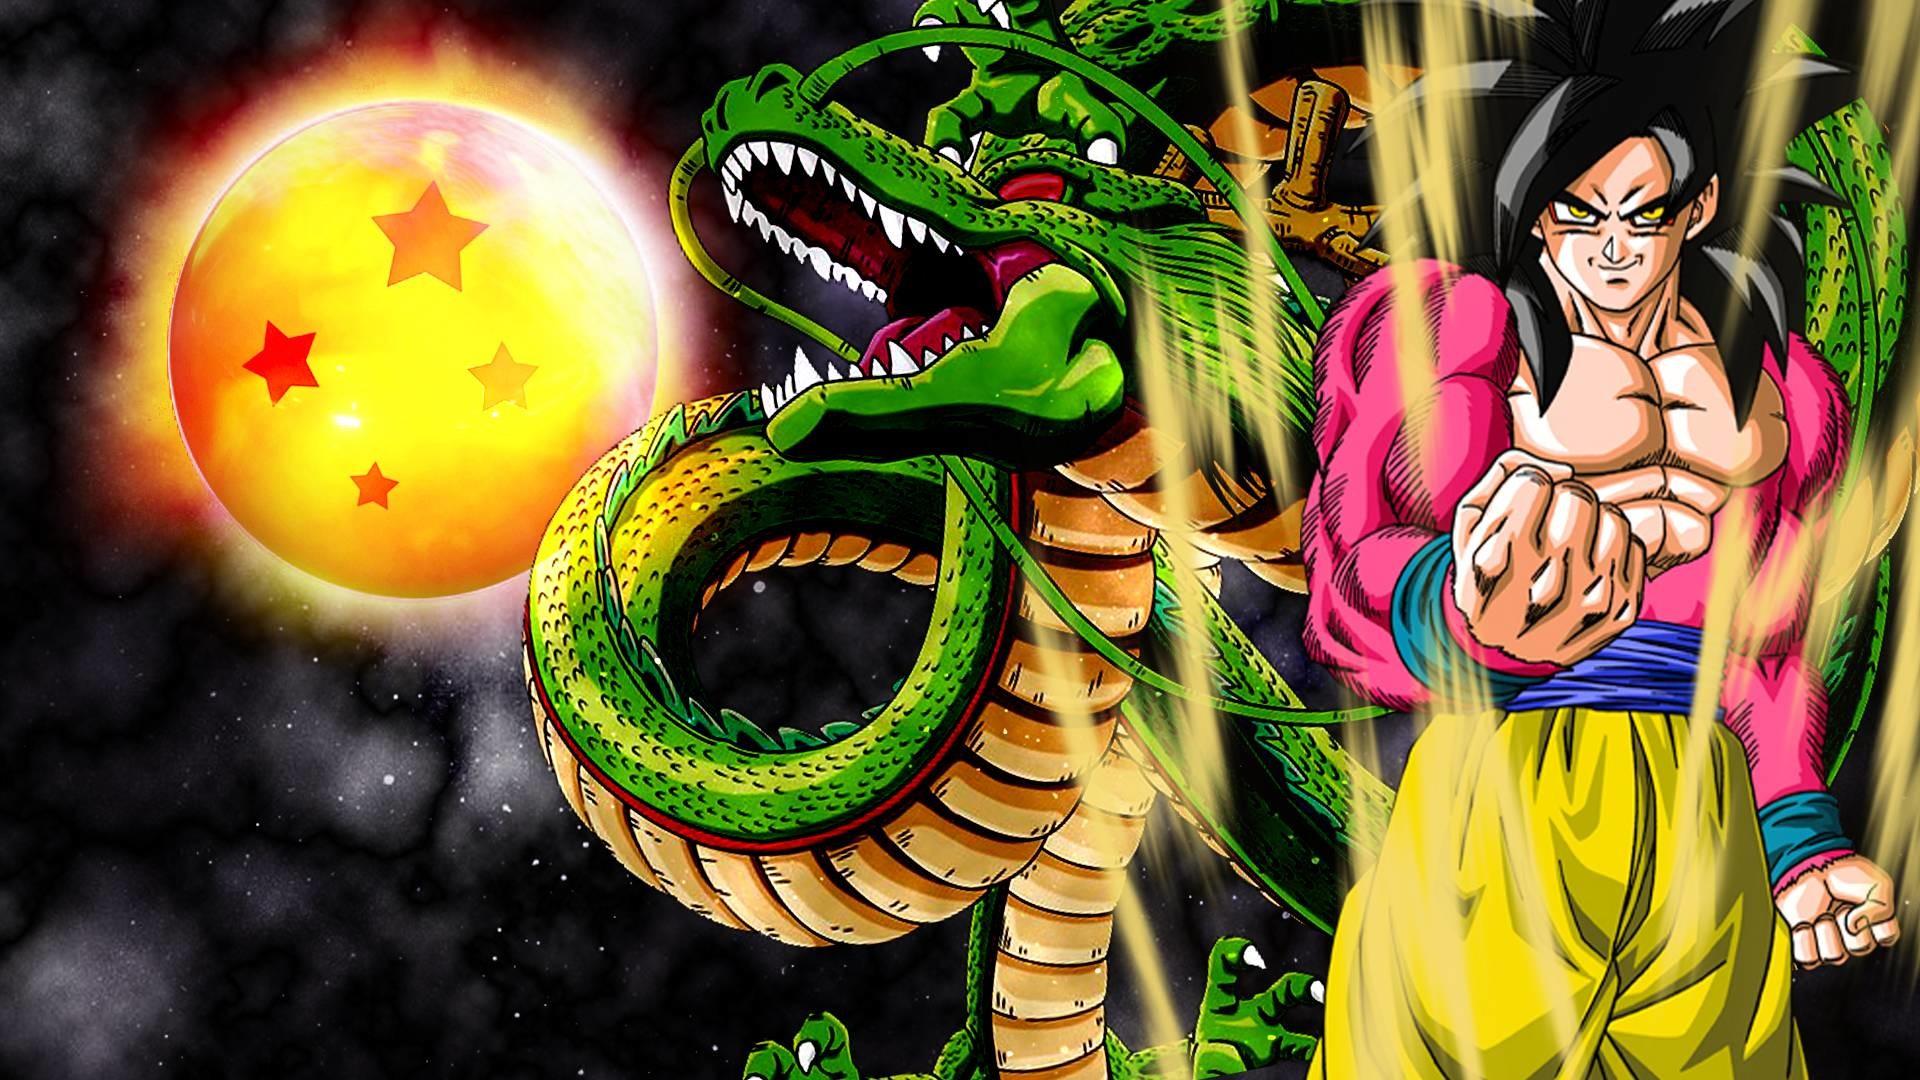 Ssj4 Goku Wallpaper – Viewing Gallery